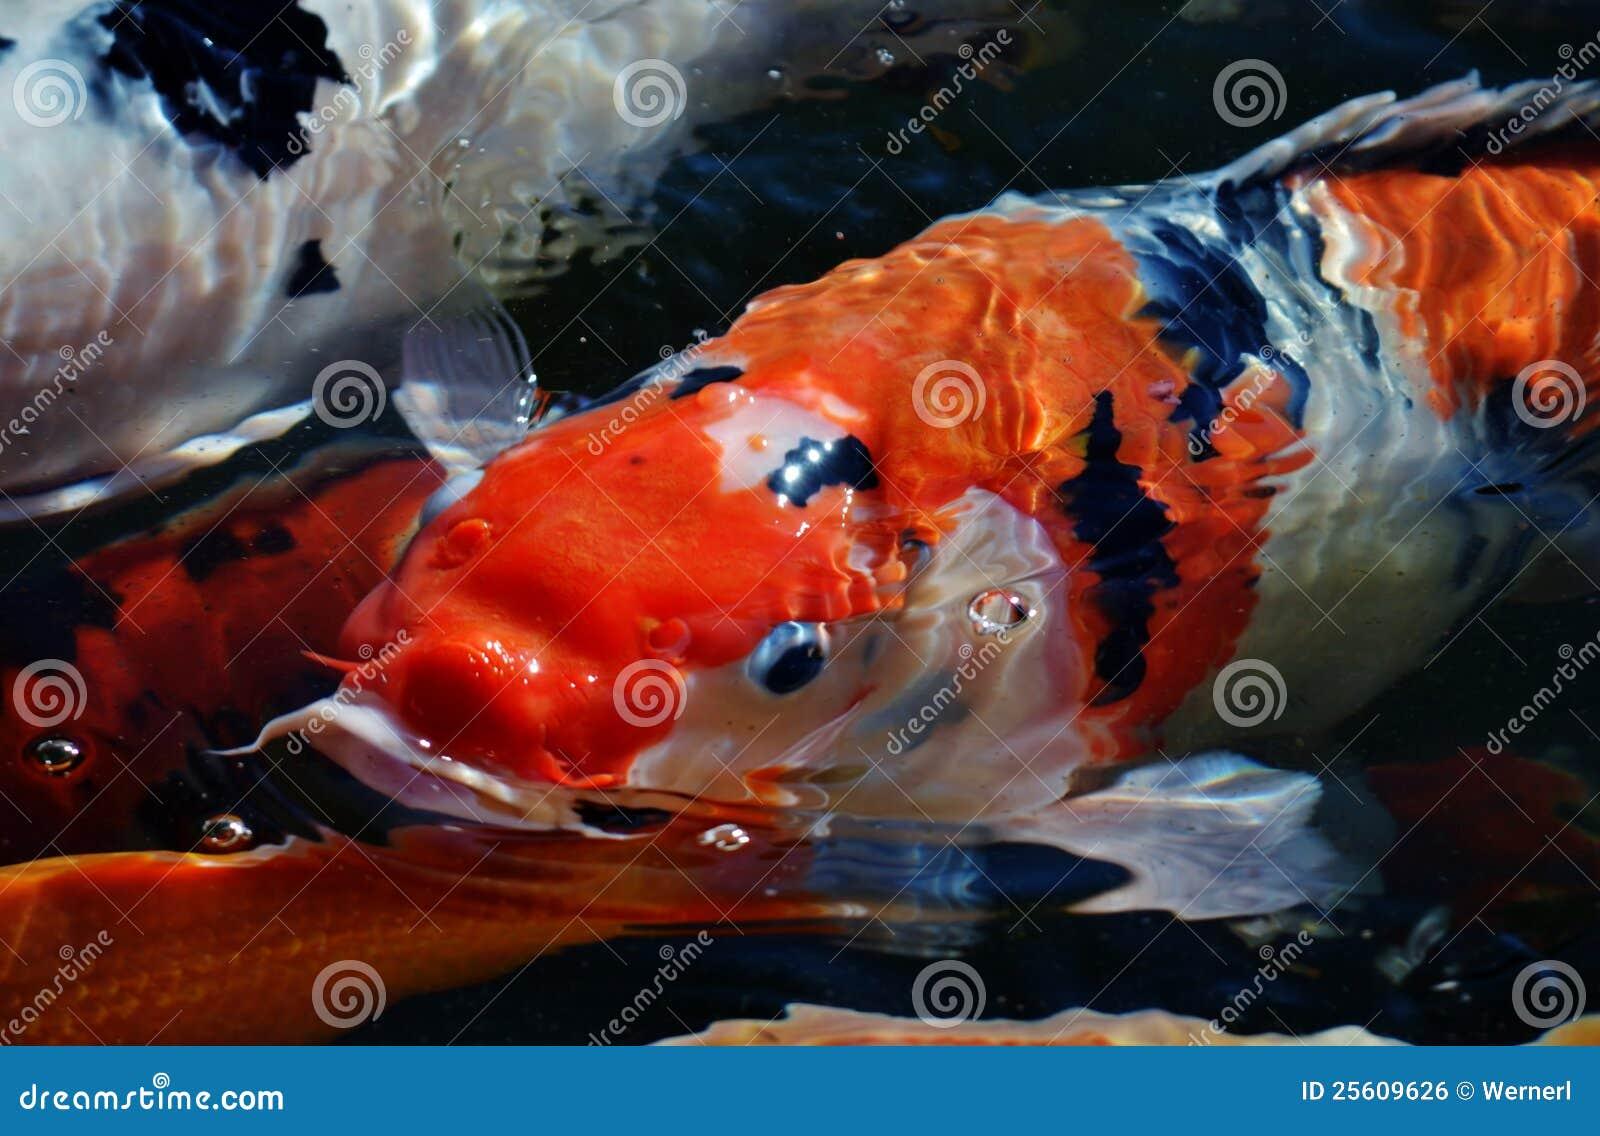 Koi fish royalty free stock image image 25609626 for Colorful pond fish